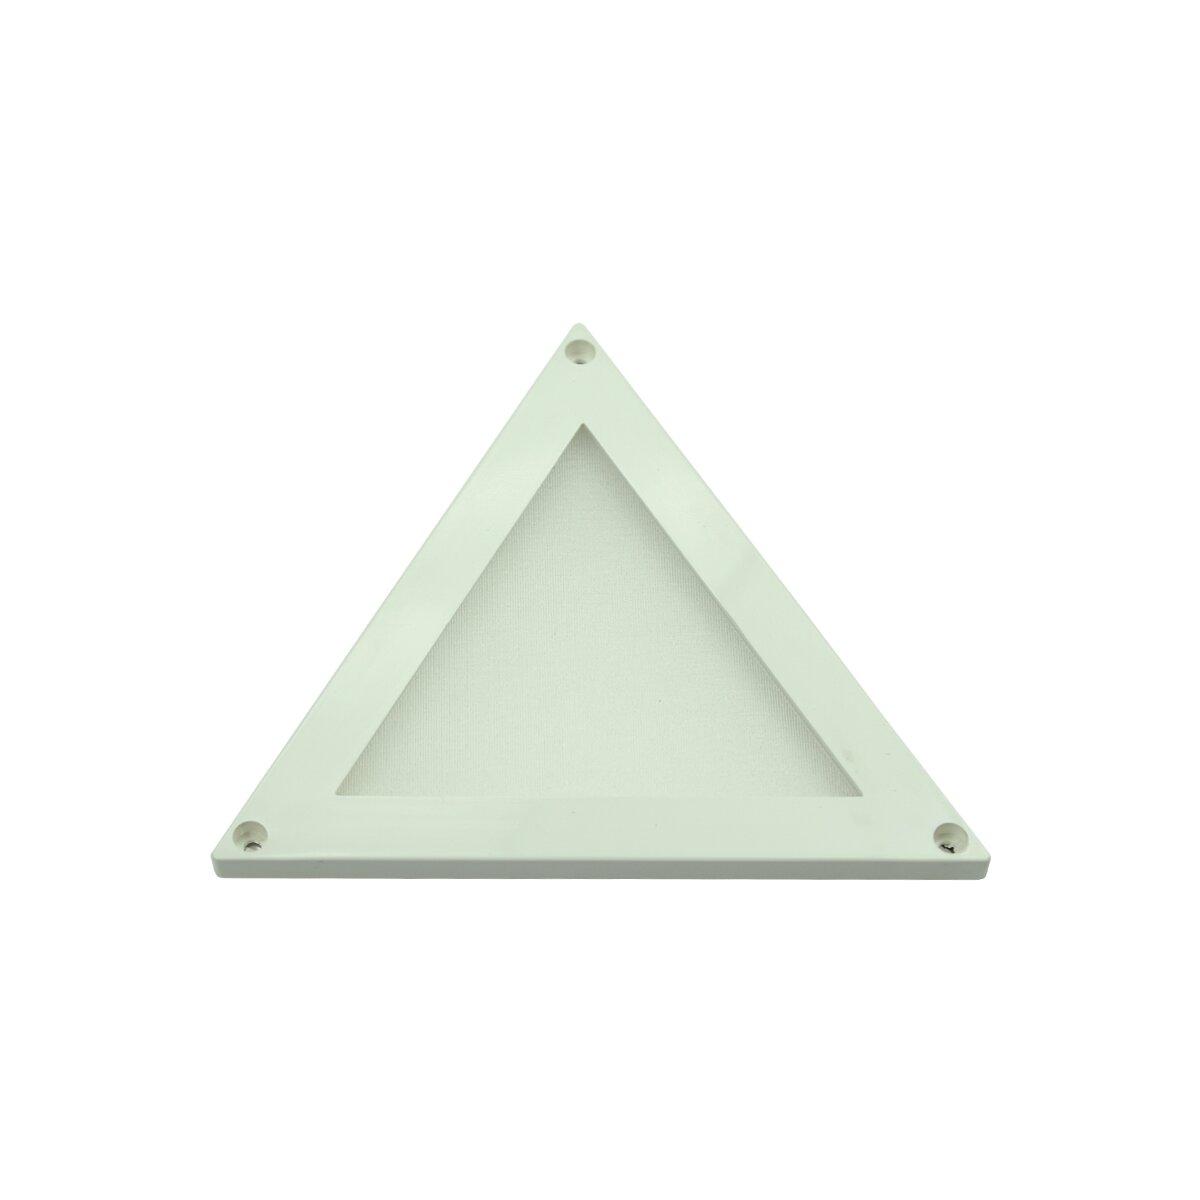 led panel mini 100 triangle 12v dc neutralweiss dimmbar 16 95. Black Bedroom Furniture Sets. Home Design Ideas